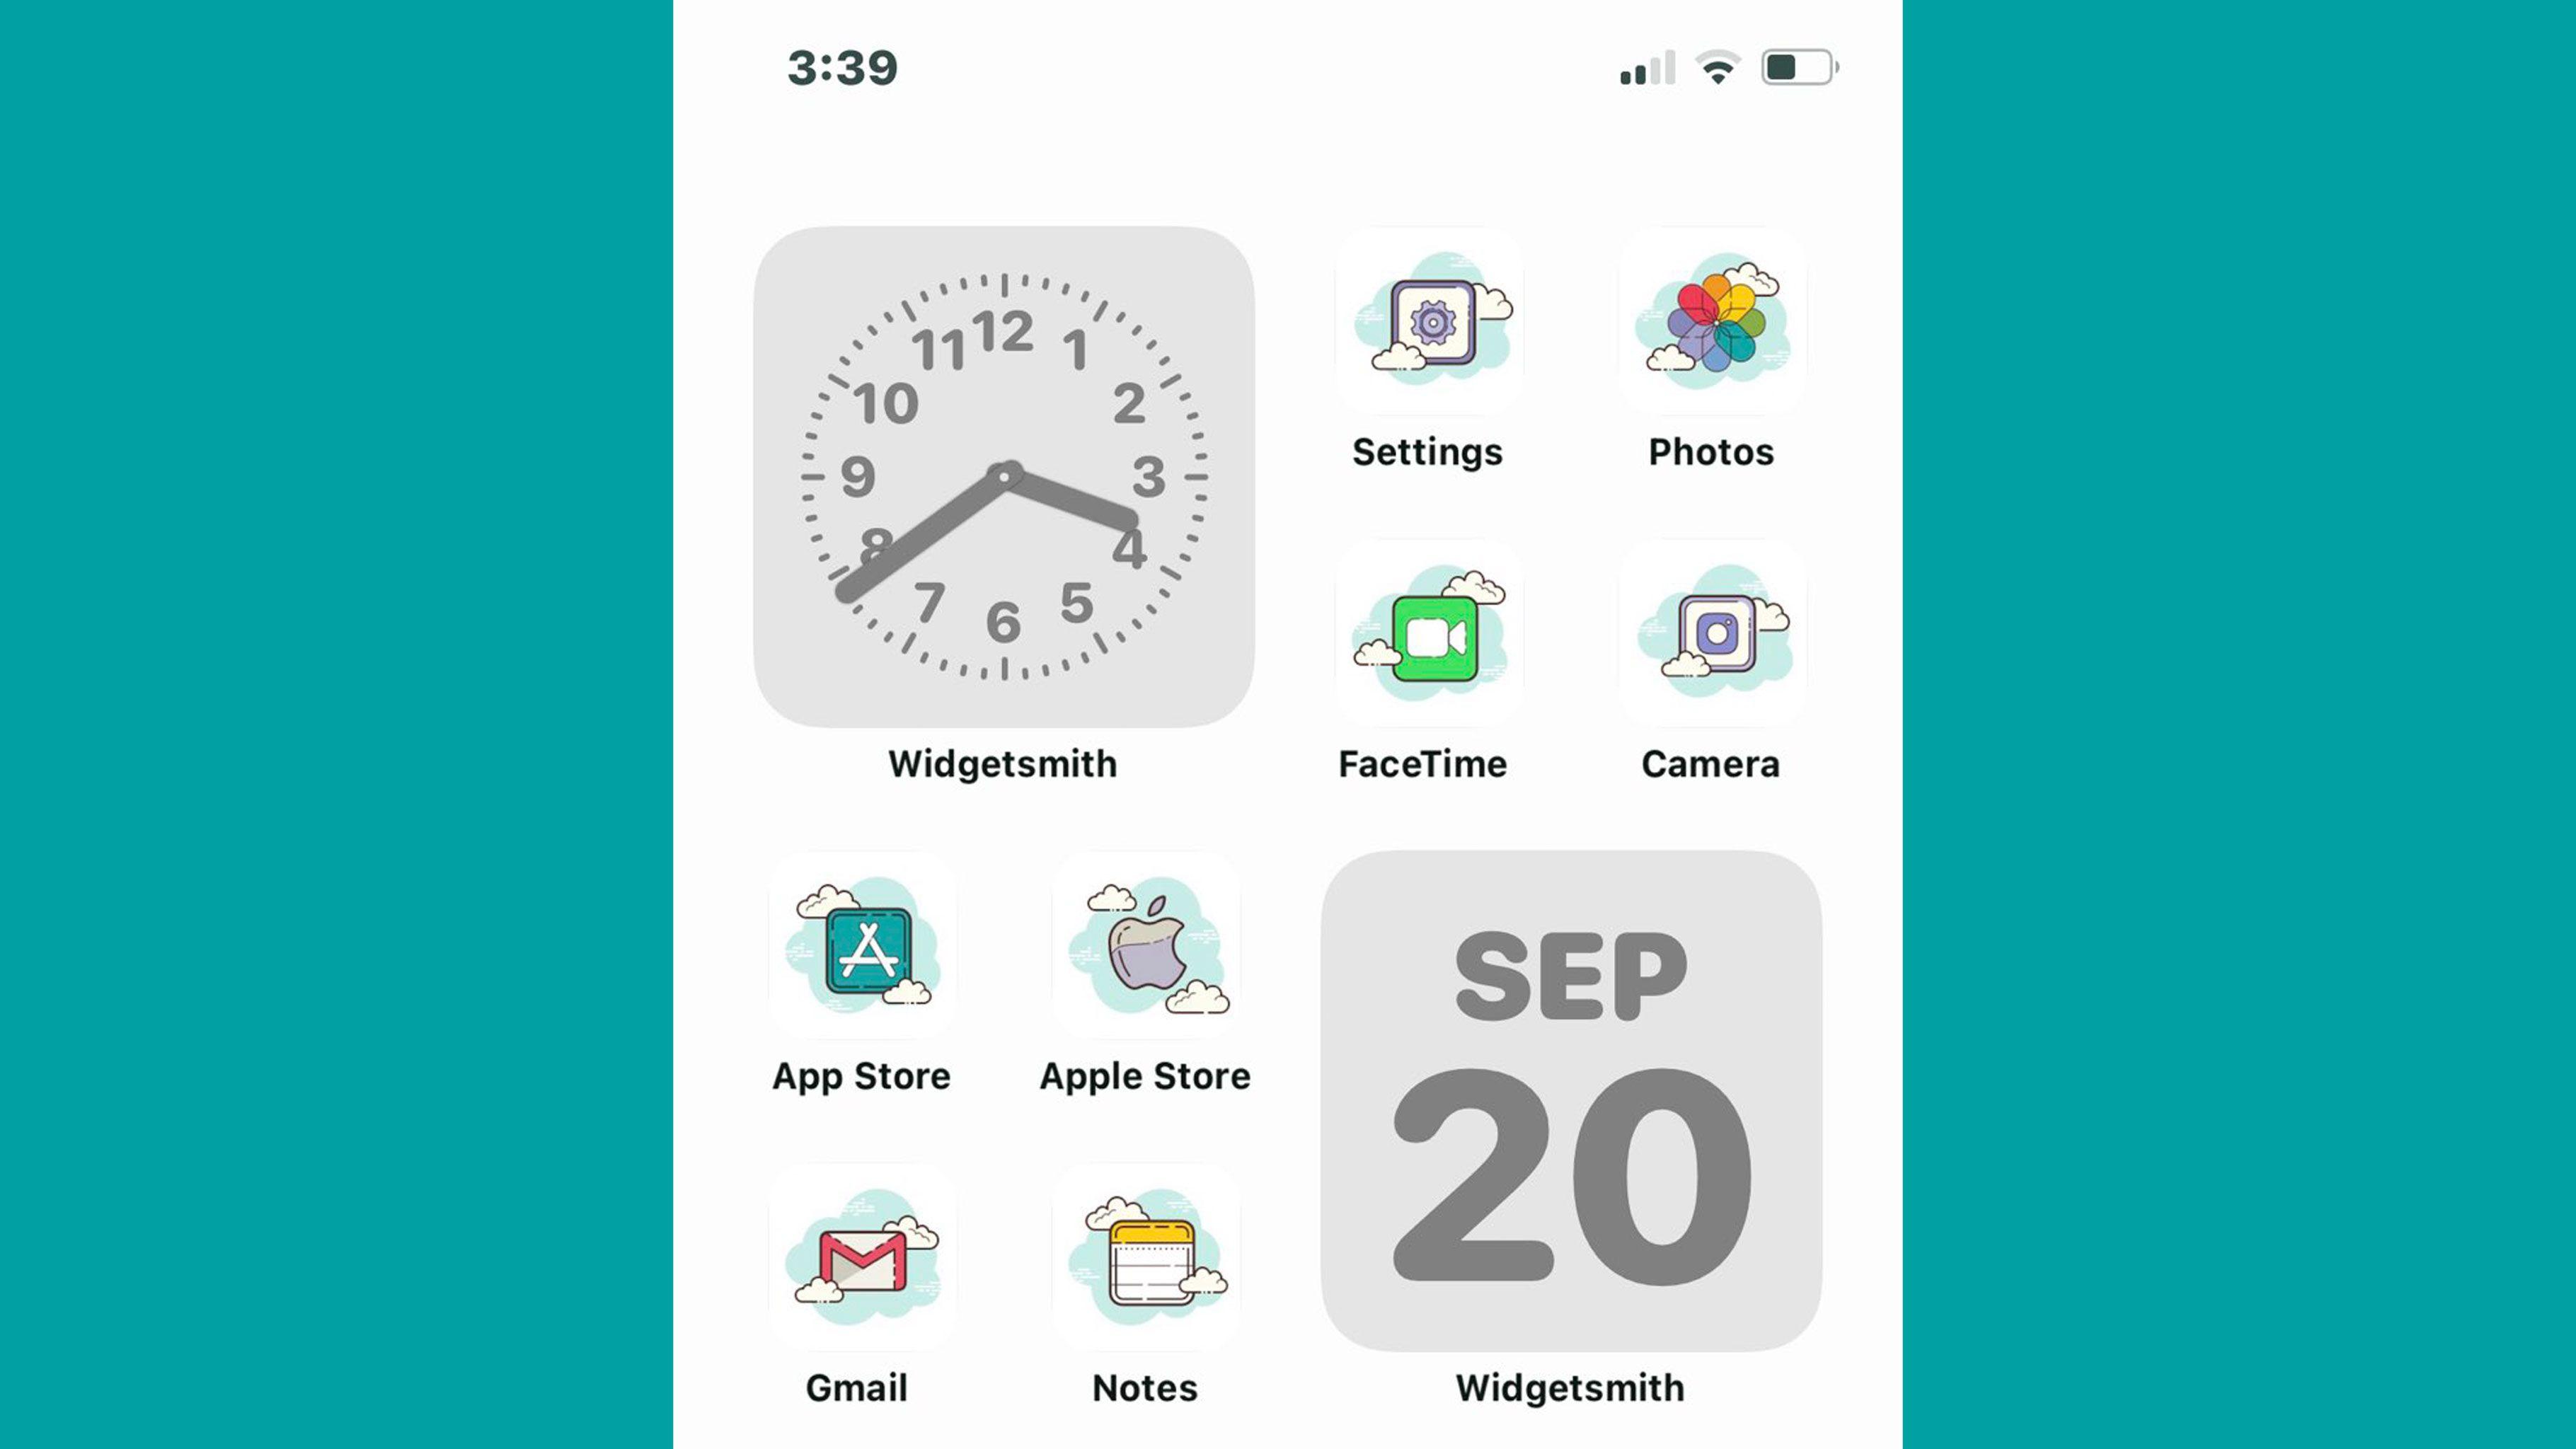 iOS 14 Widgets Offer iPhone Users Creative Home Screen Ideas thumbnail